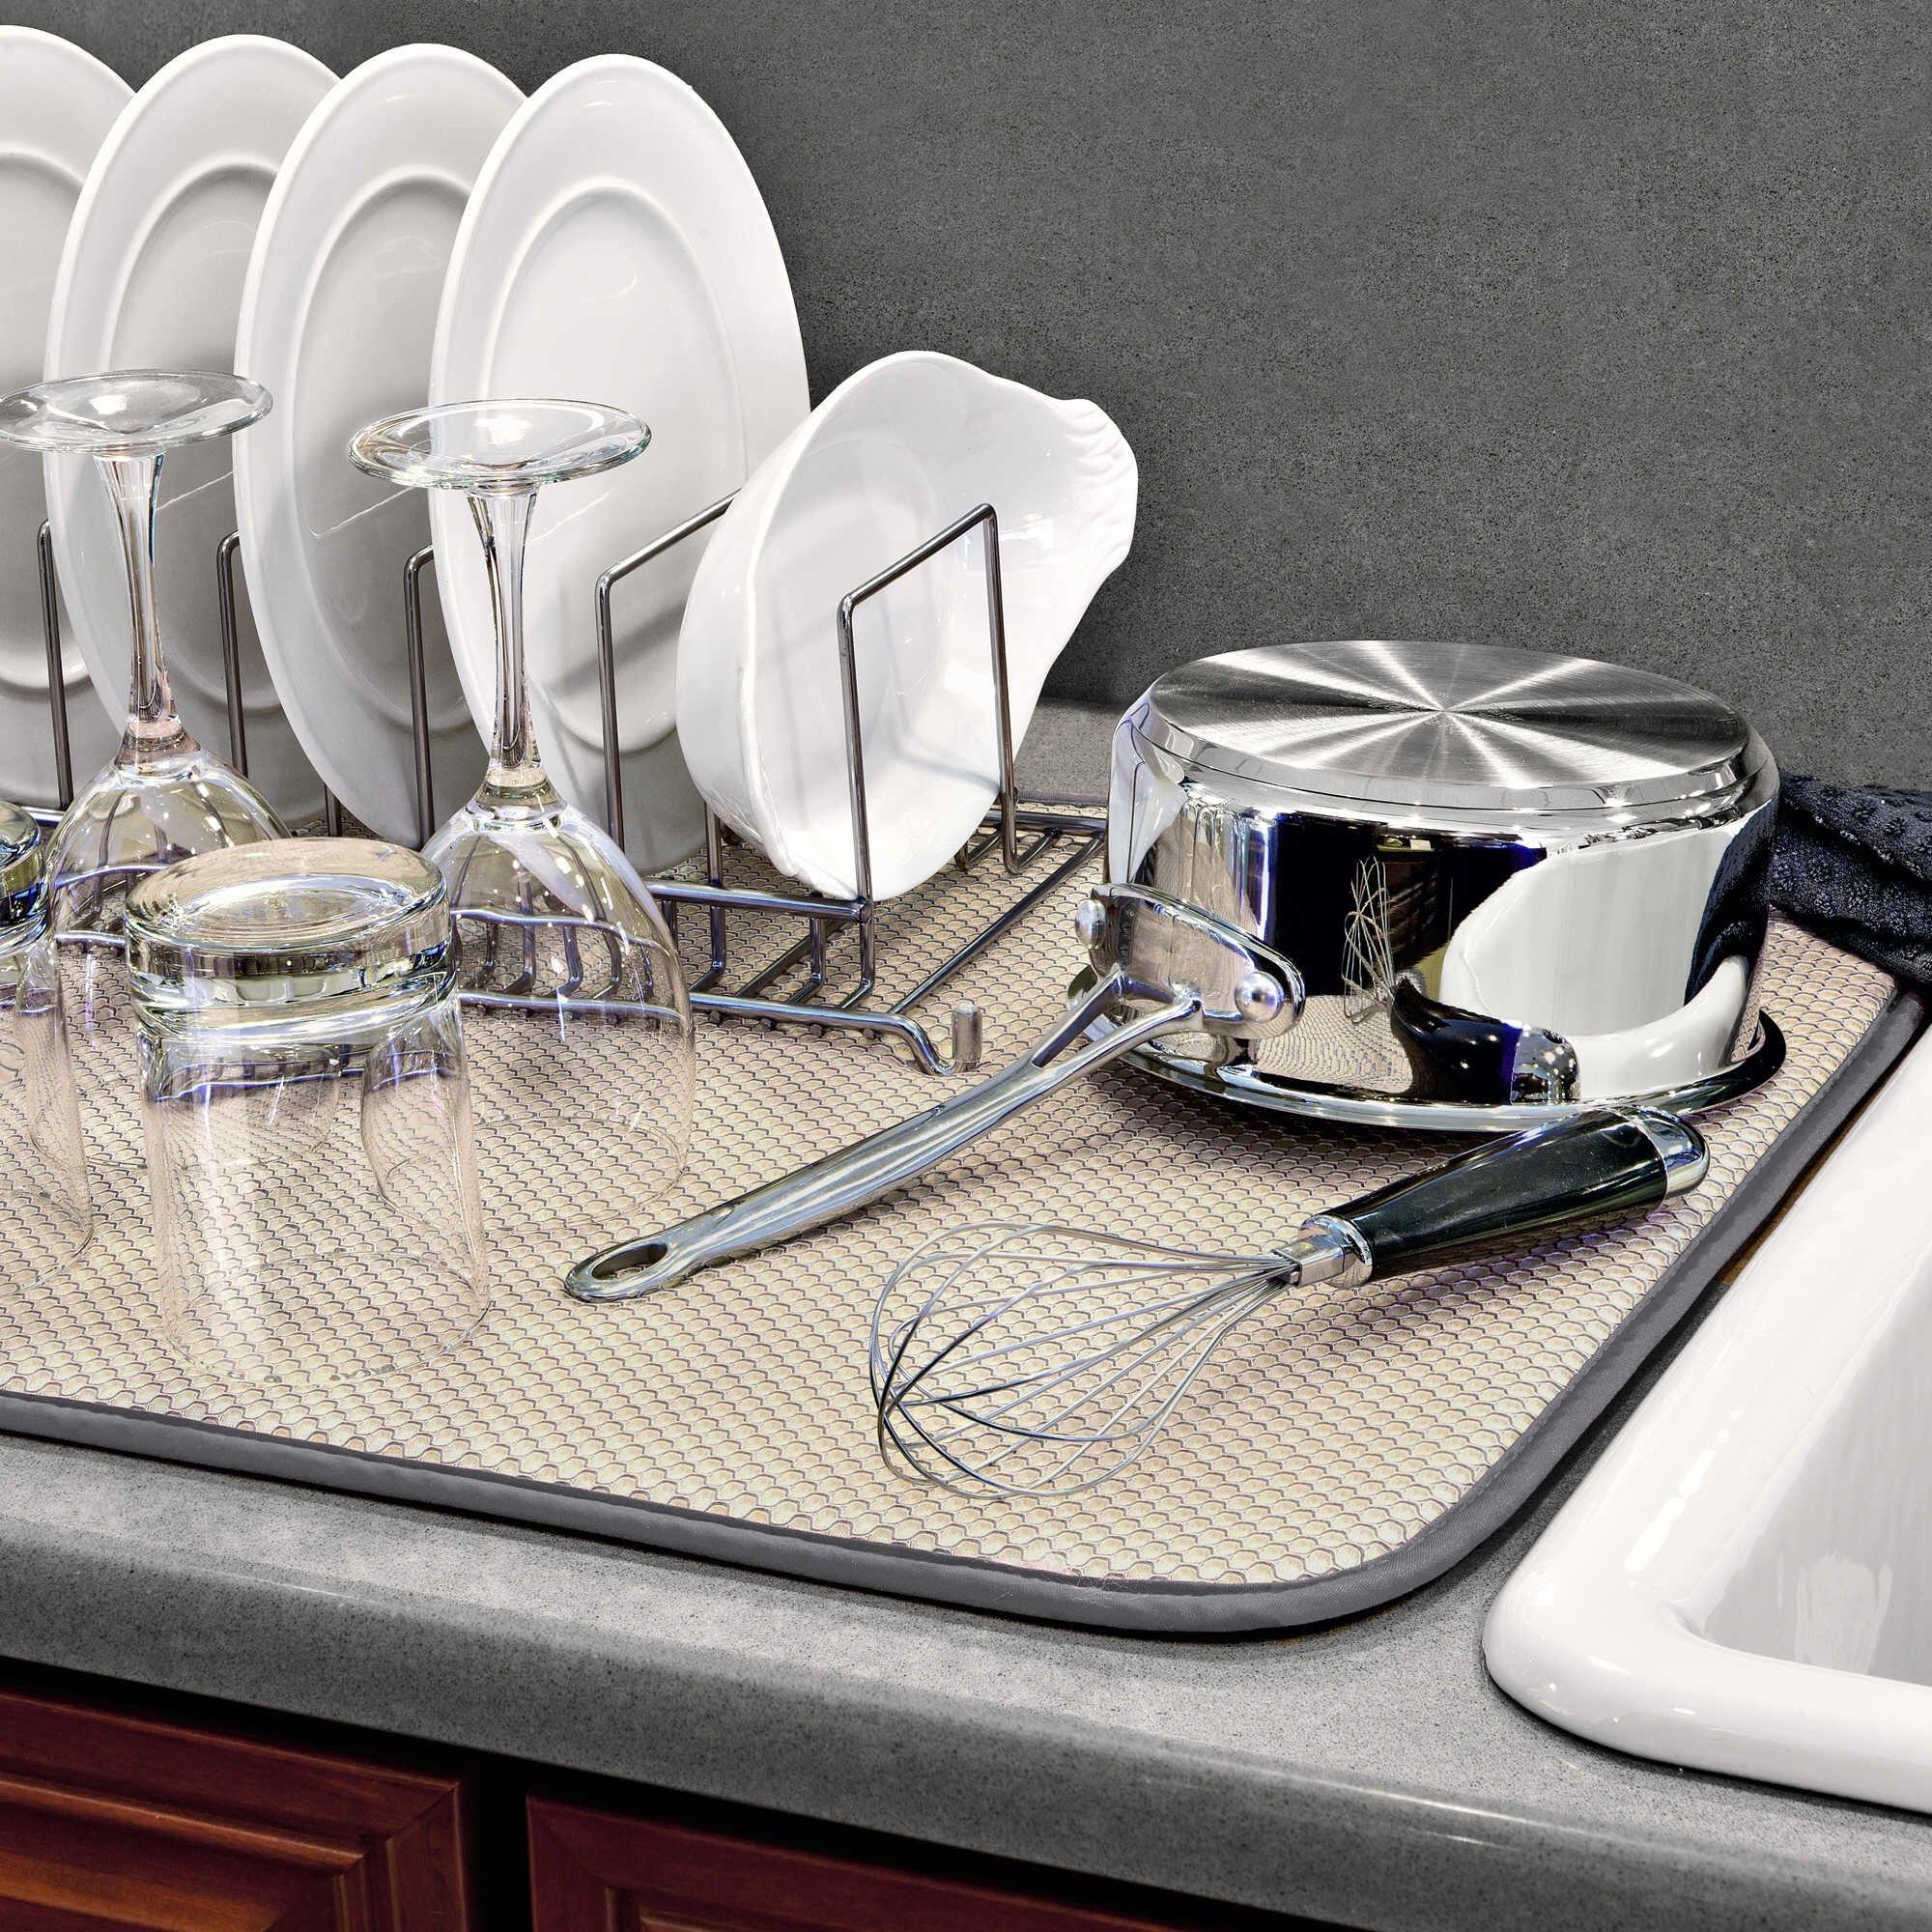 The OriginalTM XL Dual Dish Drying Mat - Dual Sided Microfiber Absorbent Machine Washable Multipurpose 18 X 24 (Grey) by Dish Drying Mat XL